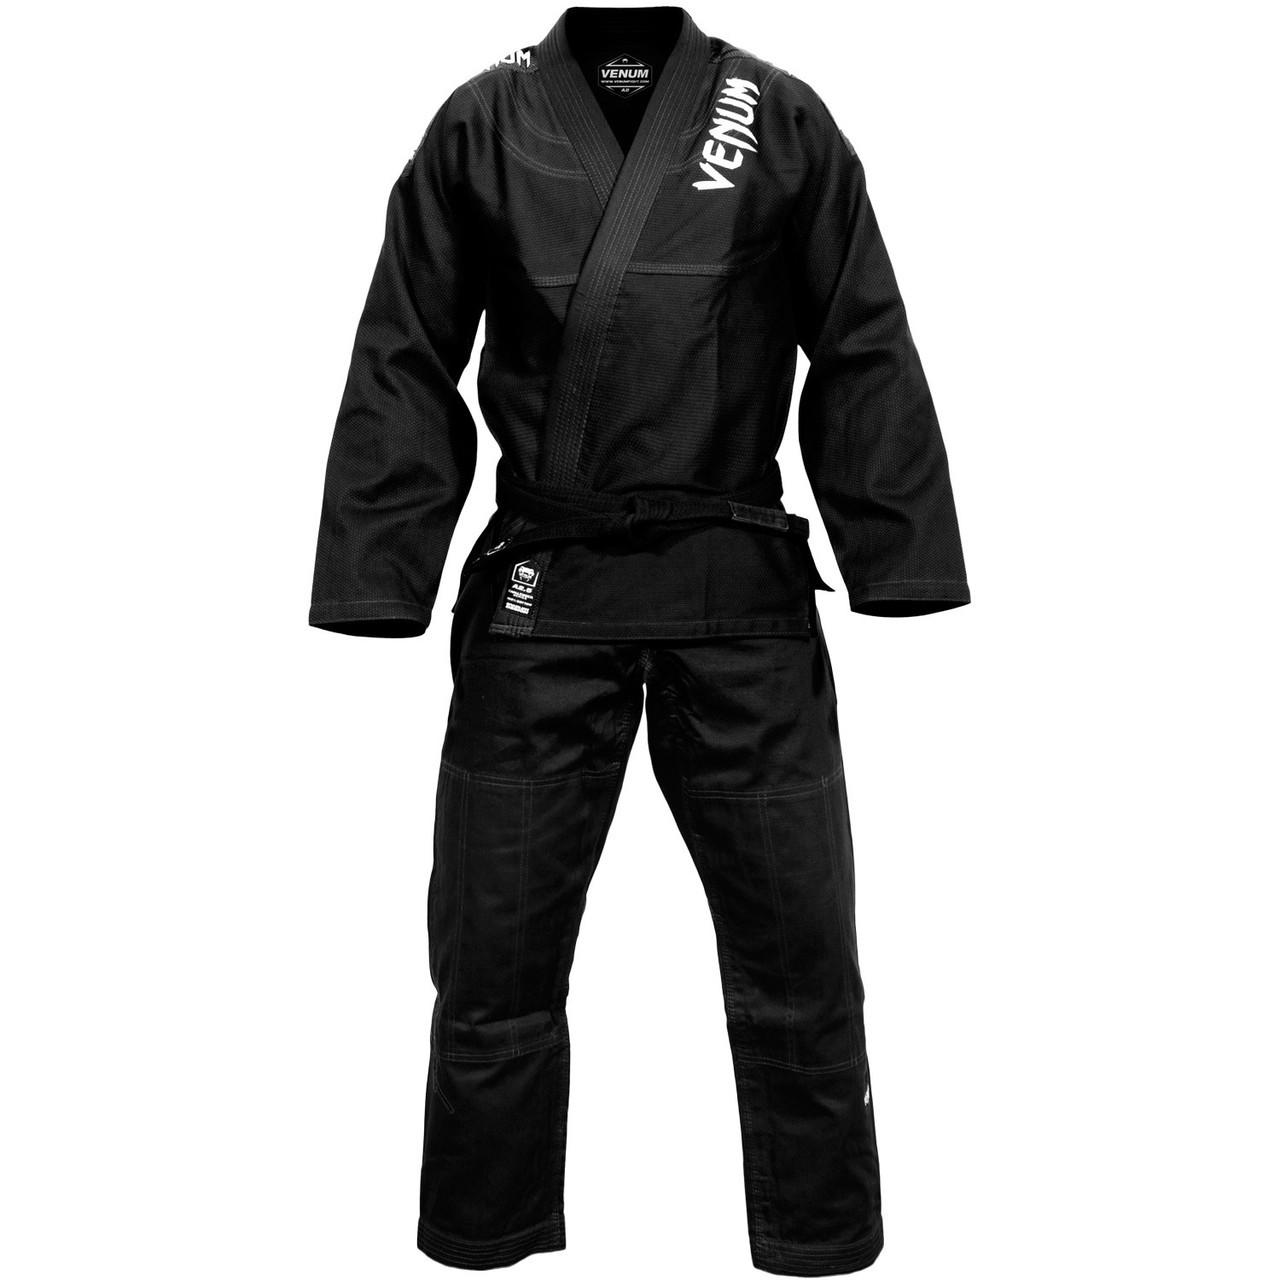 Venum challenger 3.0 BJJ Gi Black/Grey Available at www.thejiujitsushop.com  Enjoy Free Shipping from The Jiu Jitsu Shop today!